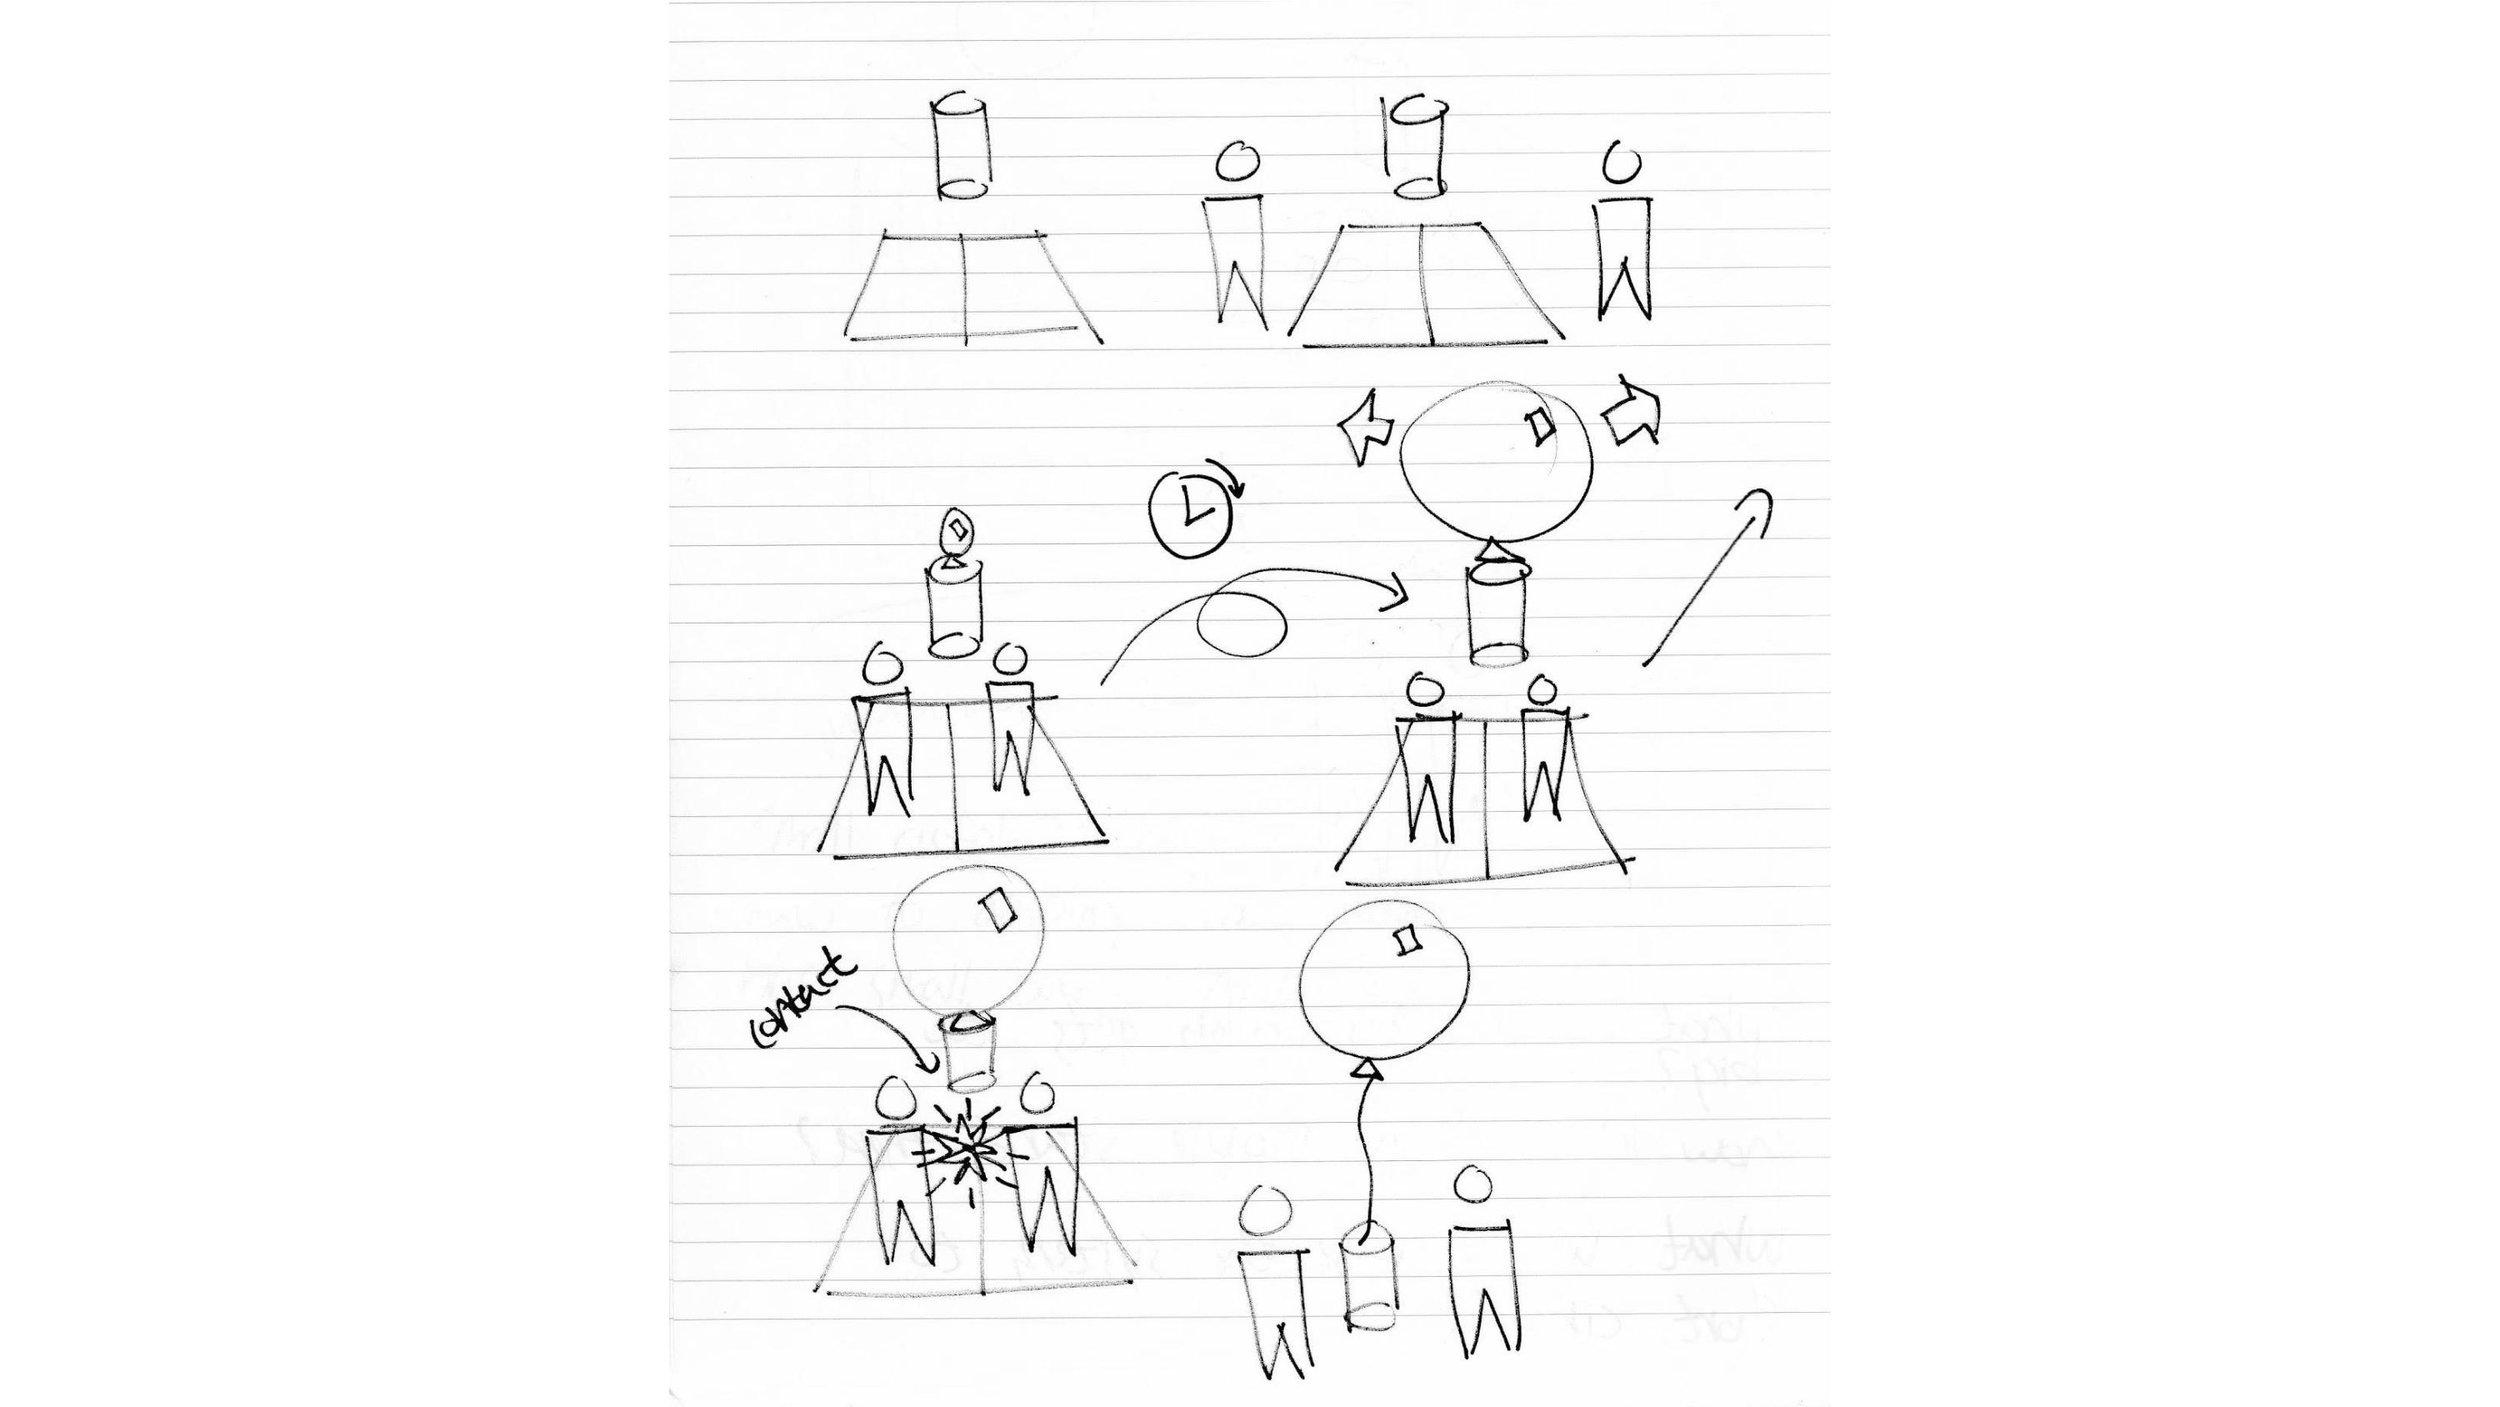 Ballon Project Presentation Sketch Export-page-002.jpg